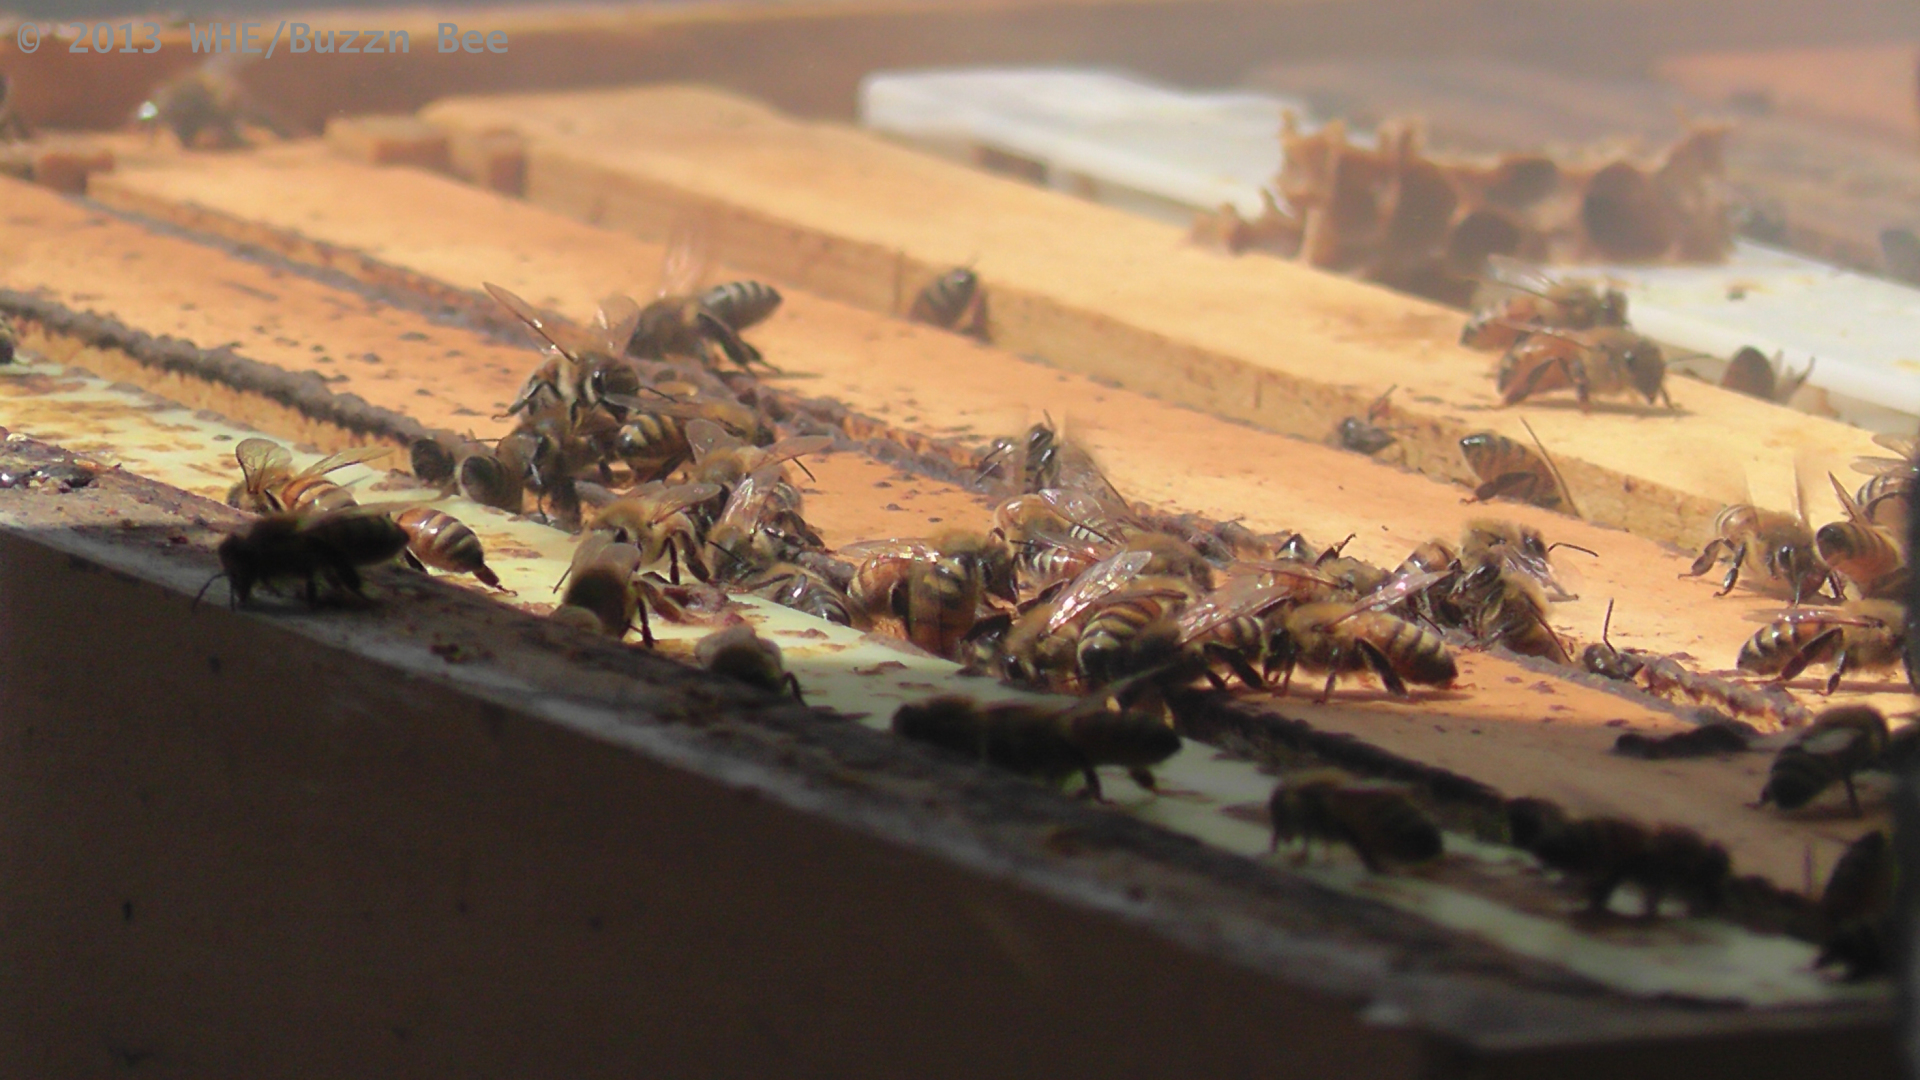 Inside a bee box